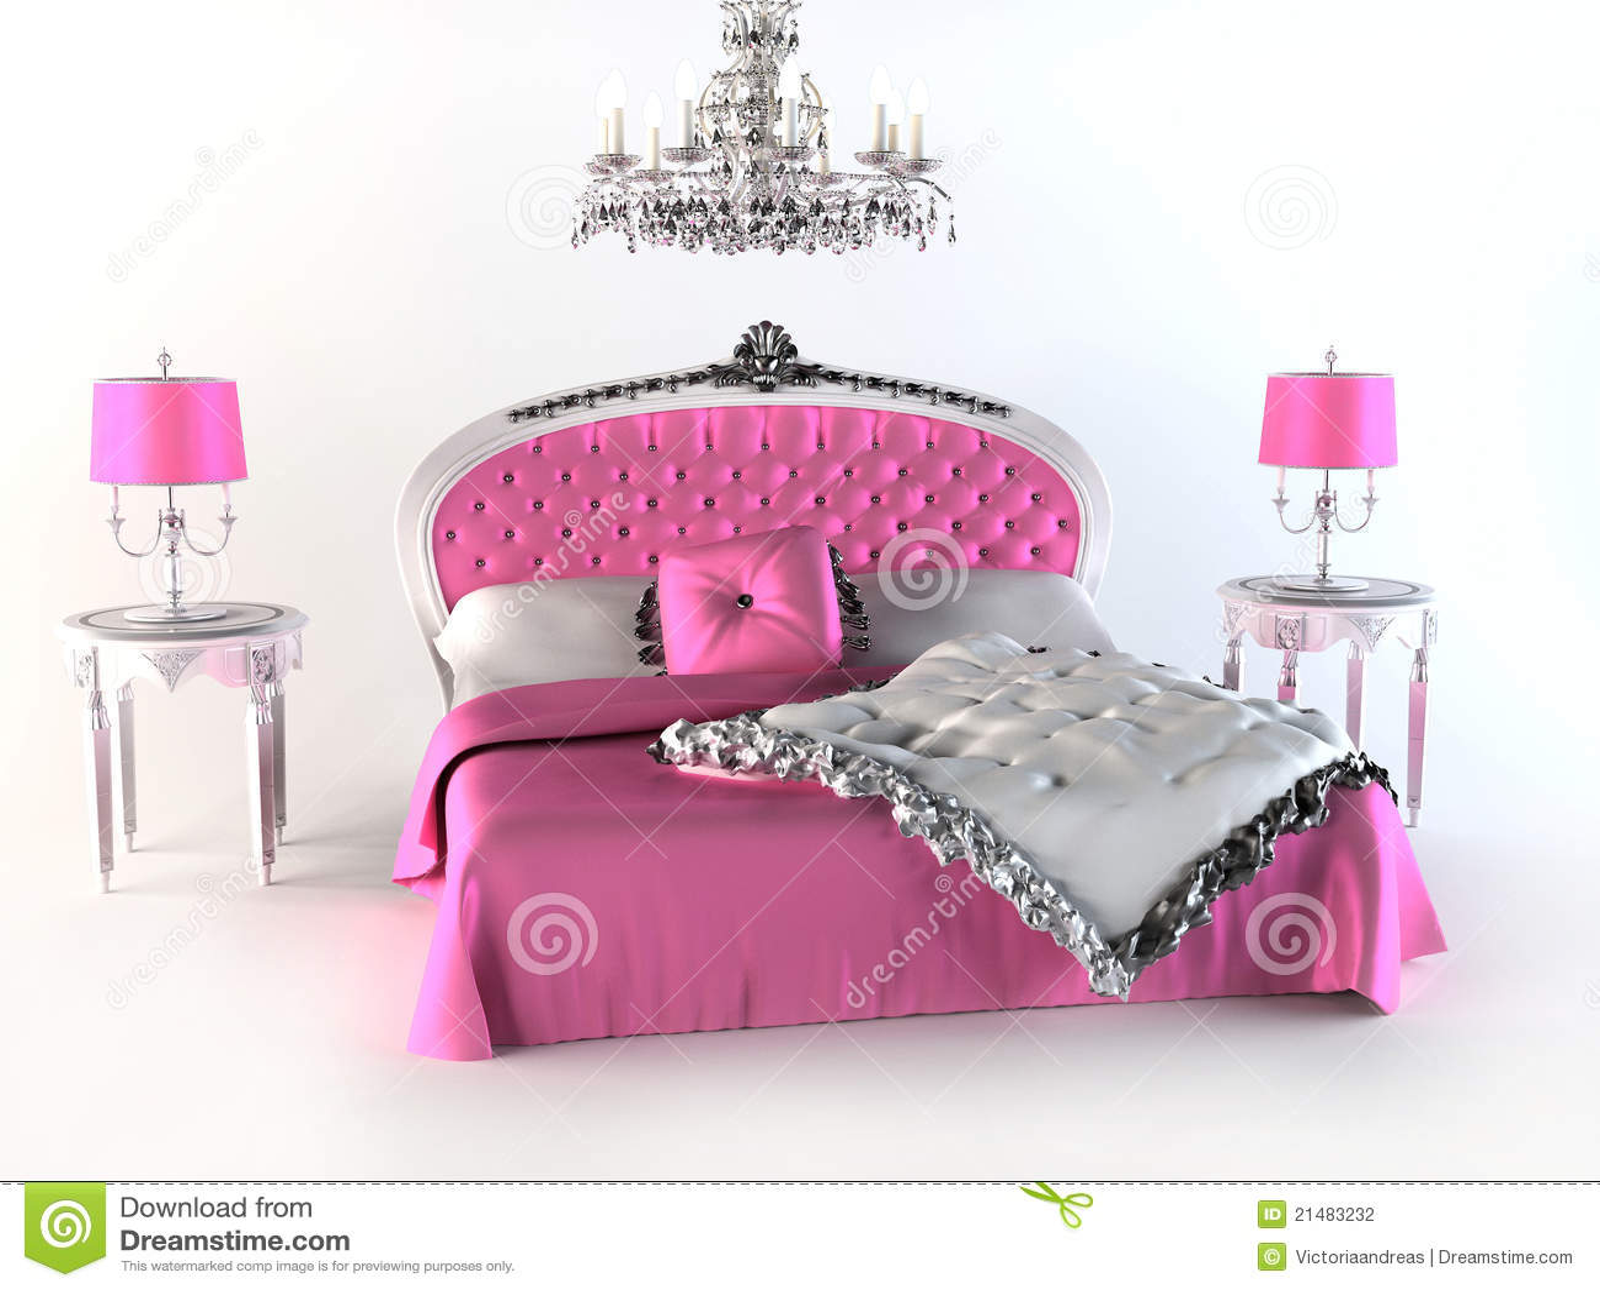 Slaapkamer Lamp Roze : Slaapkamer lamp roze u artsmedia